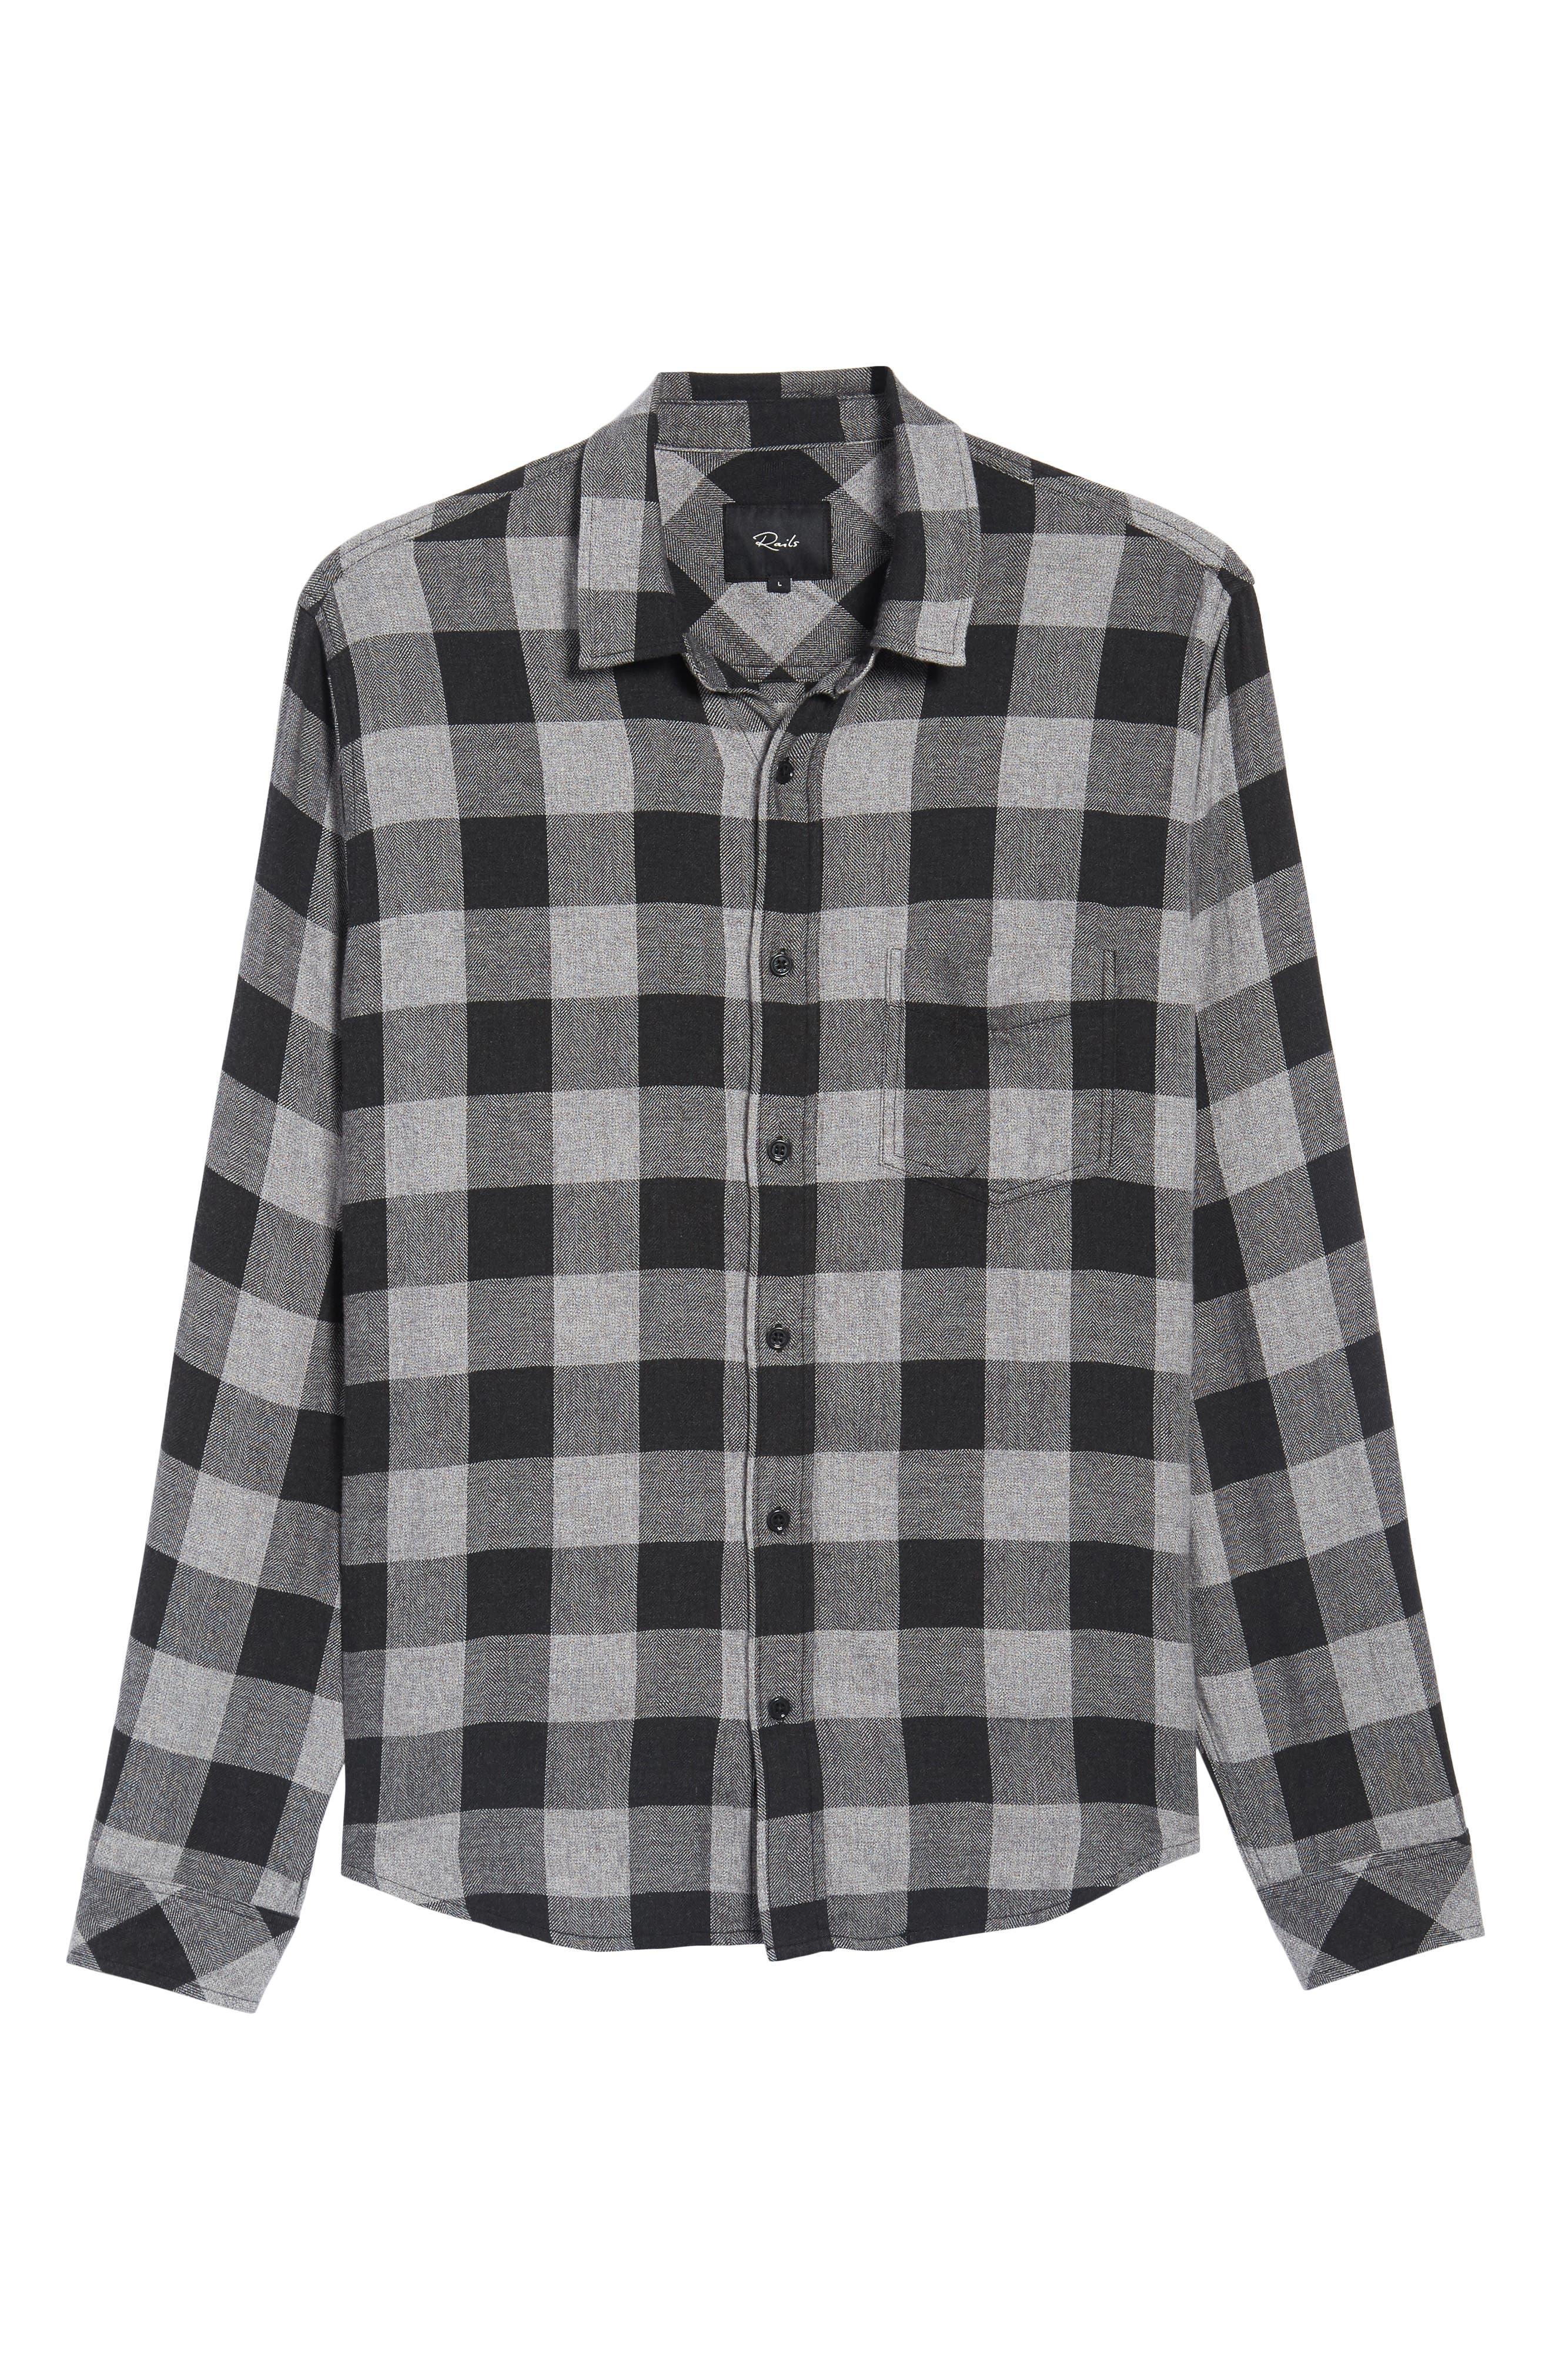 Lennox Sport Shirt,                             Alternate thumbnail 6, color,                             CHARCOAL/ BLACK CHECK